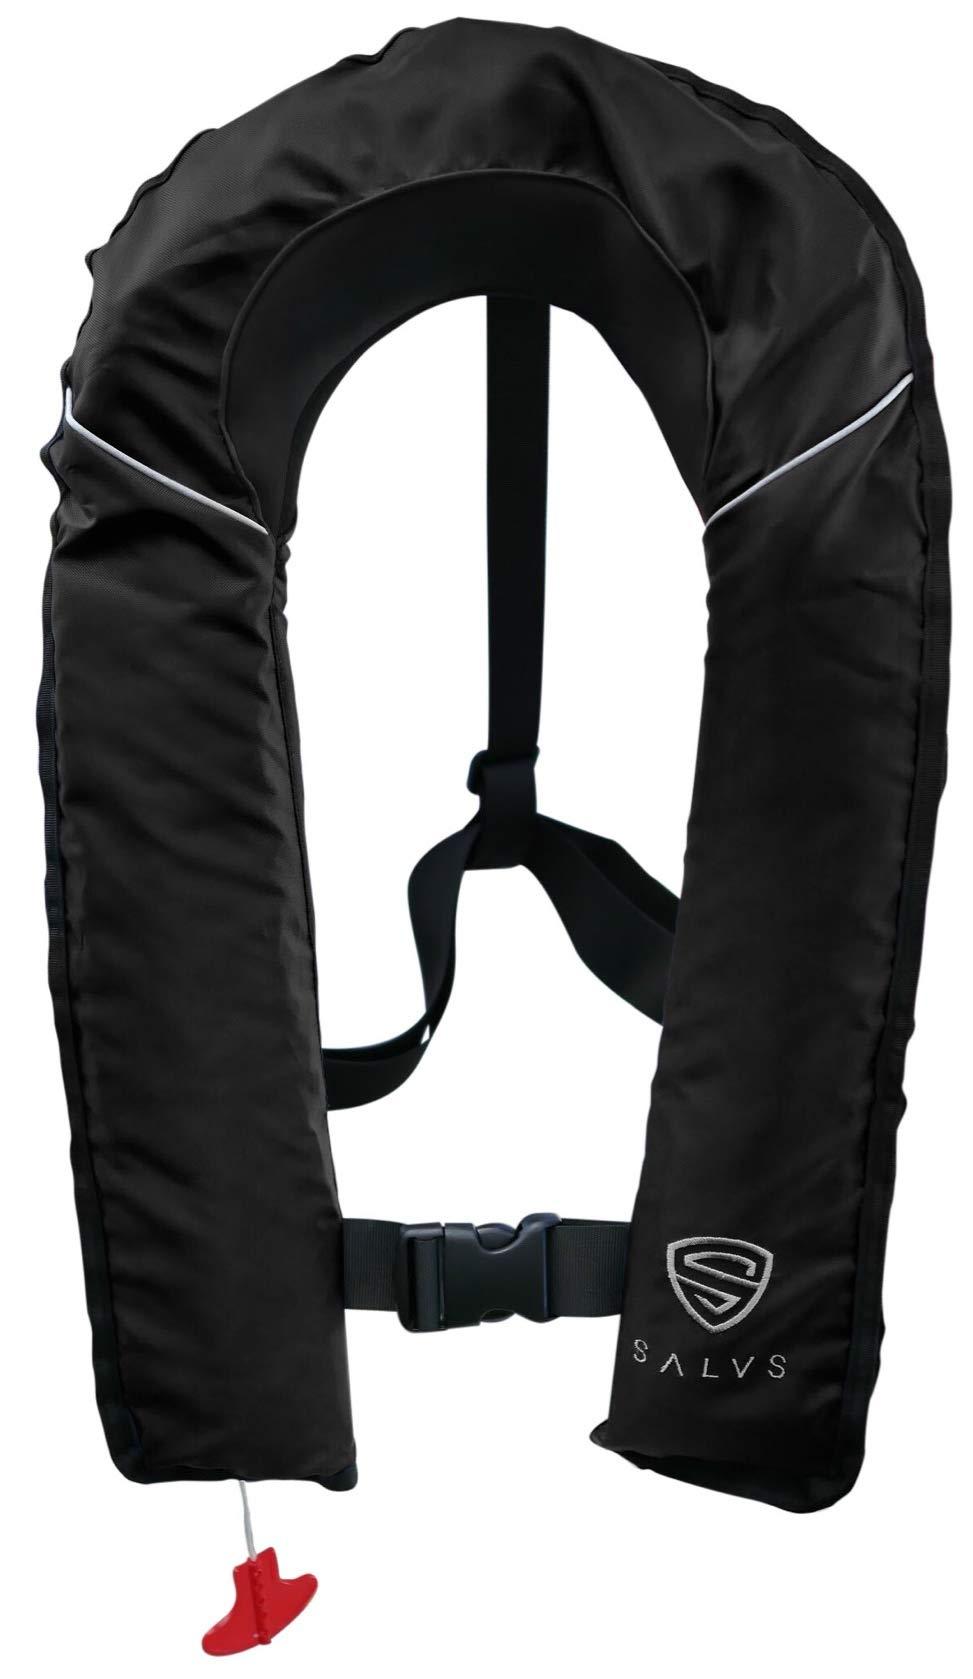 Life Vest for Men /& Women Floatation Swim Vest Fishing PFD for Kayak SALVS Automatic//Manual Inflatable Life Jacket for Adults Sailing